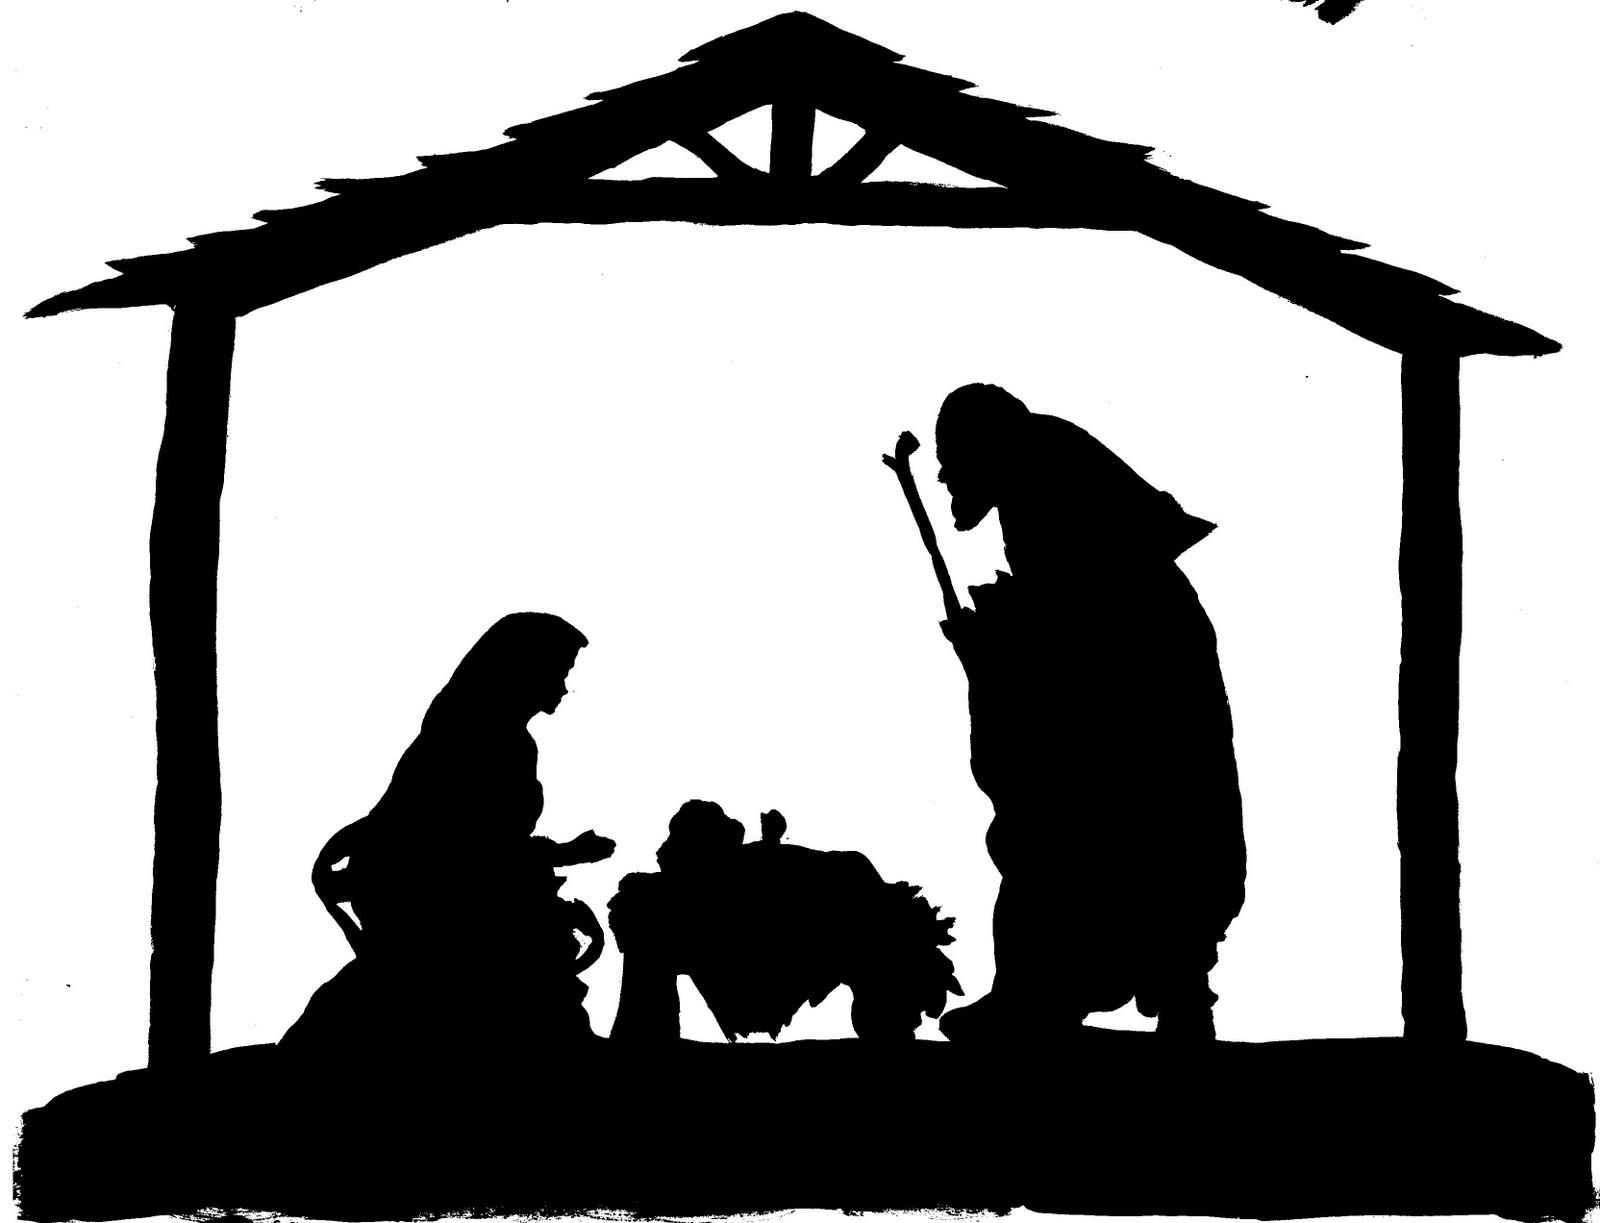 For Christmas Nativity Nativity Scene Png